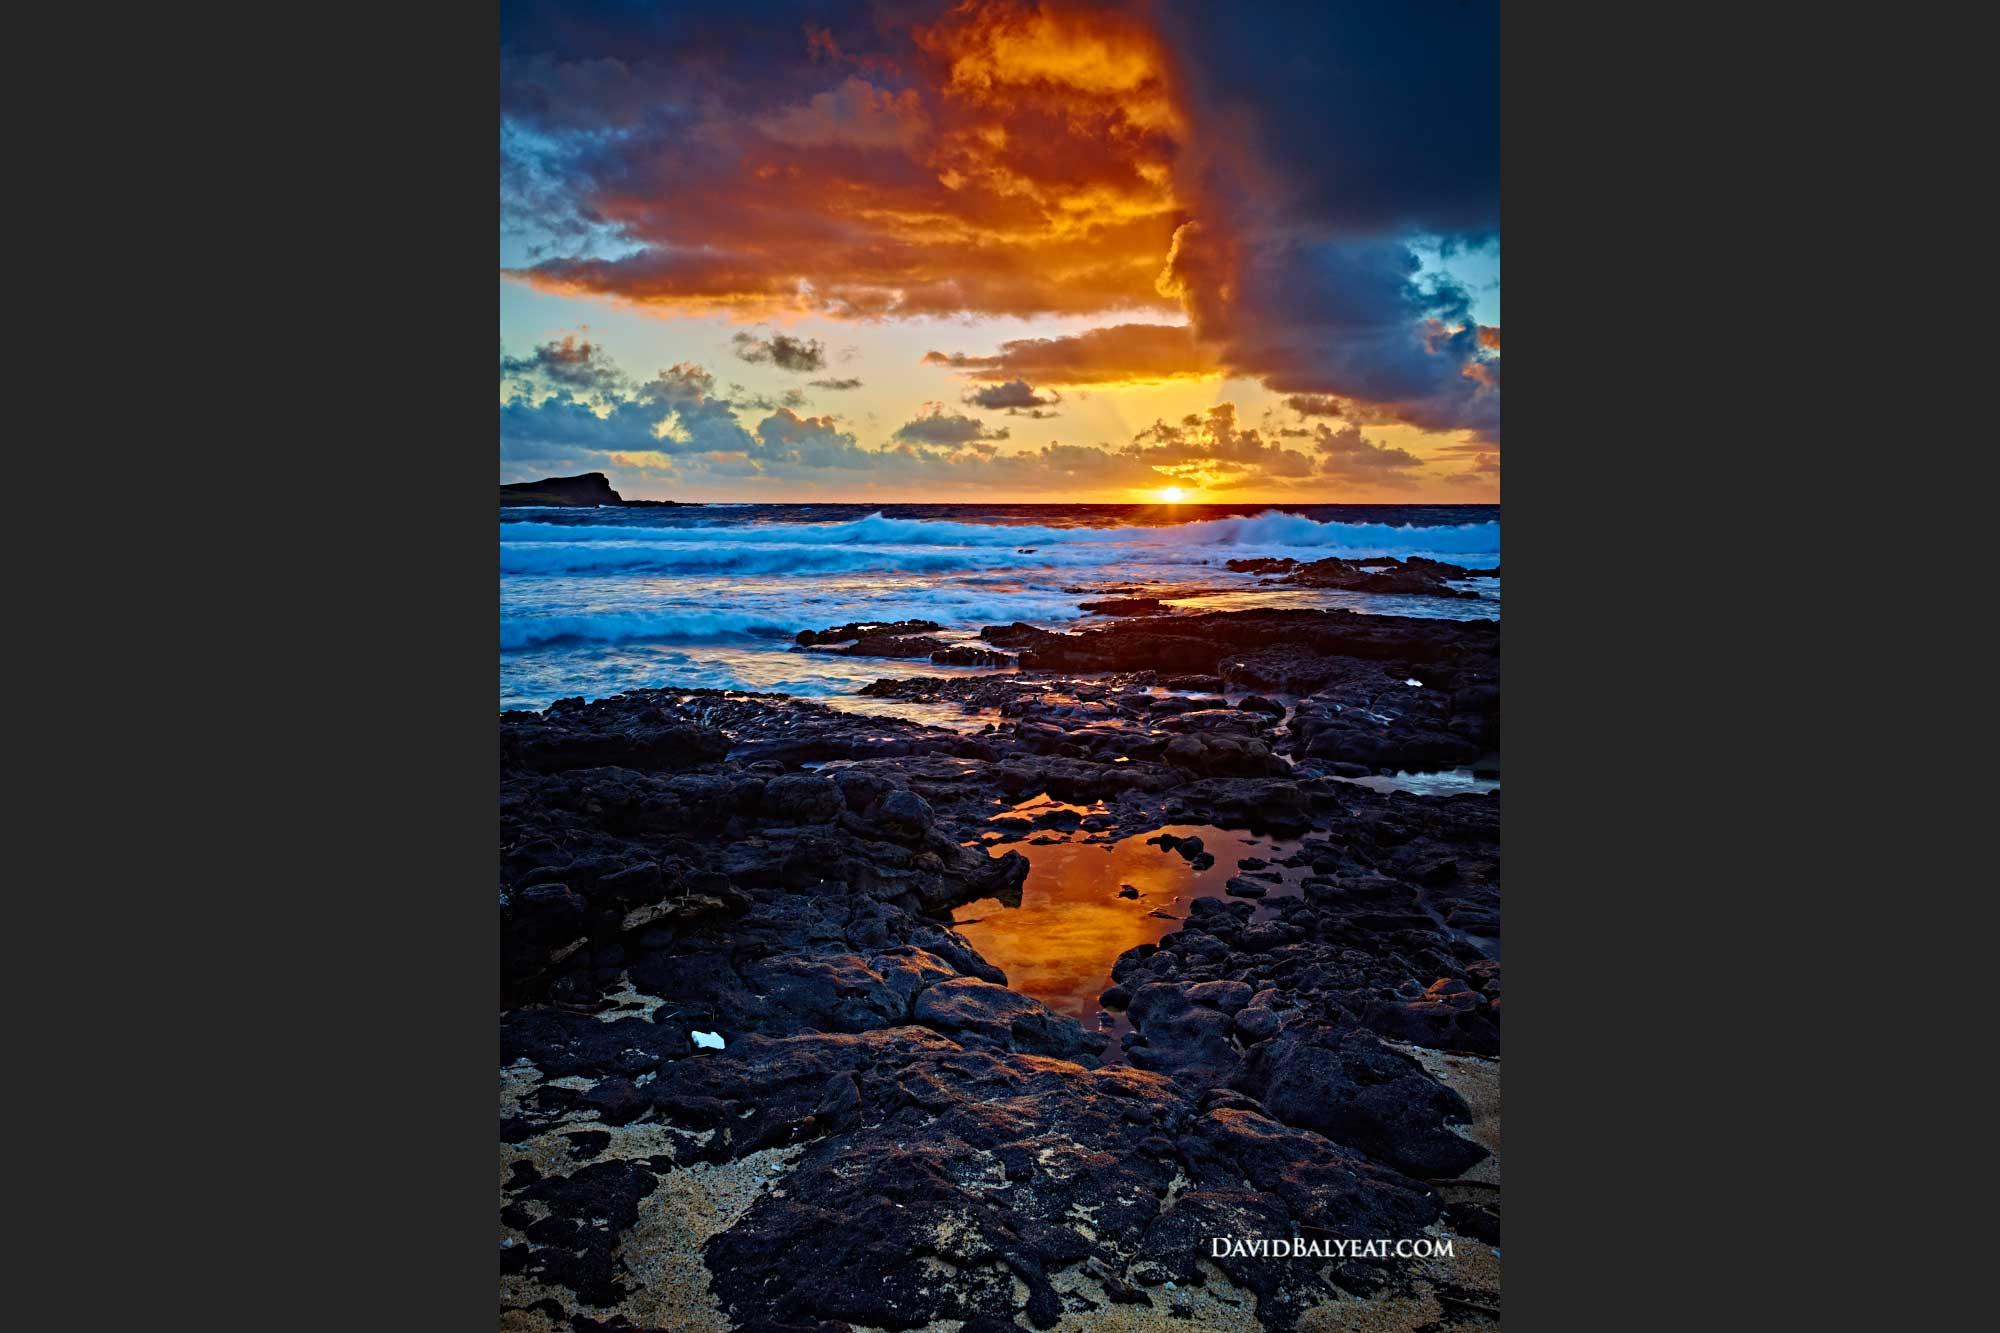 Hawaii sunrise Oahu Makapu'u Beach Park tide pools high definition HD professional landscape fine art photography